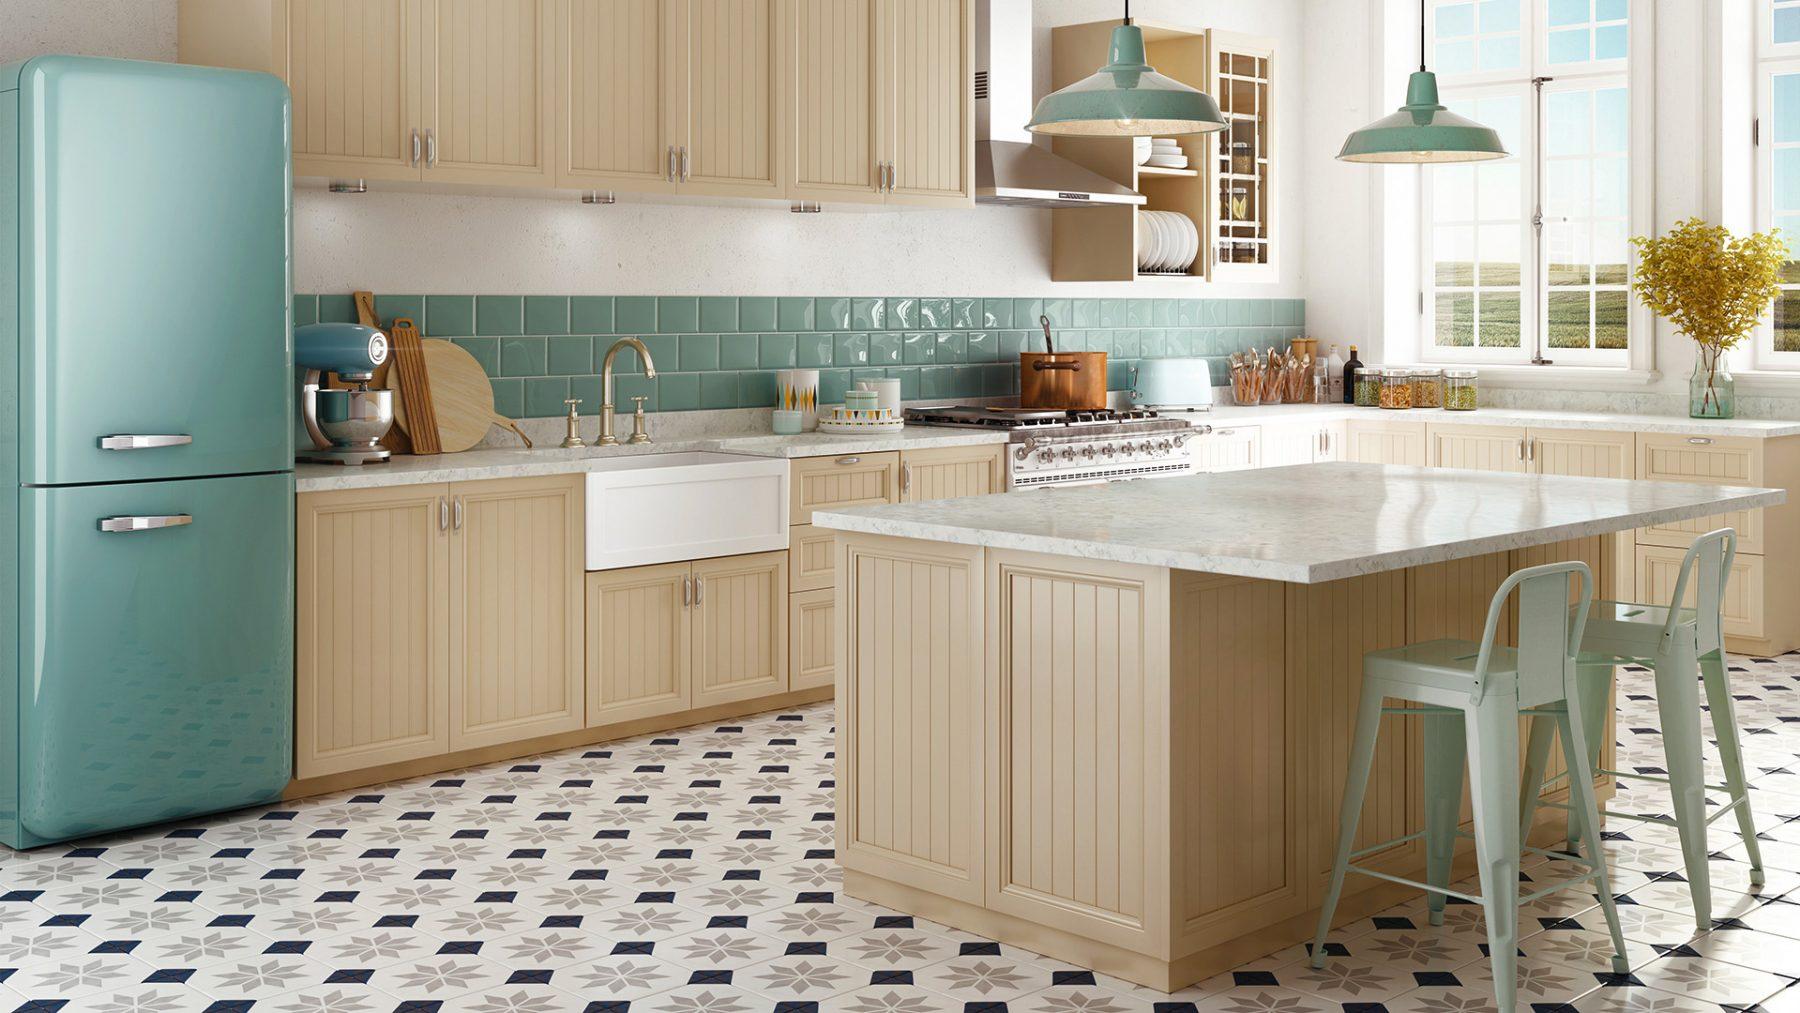 3d photo retro vintage kitchen design